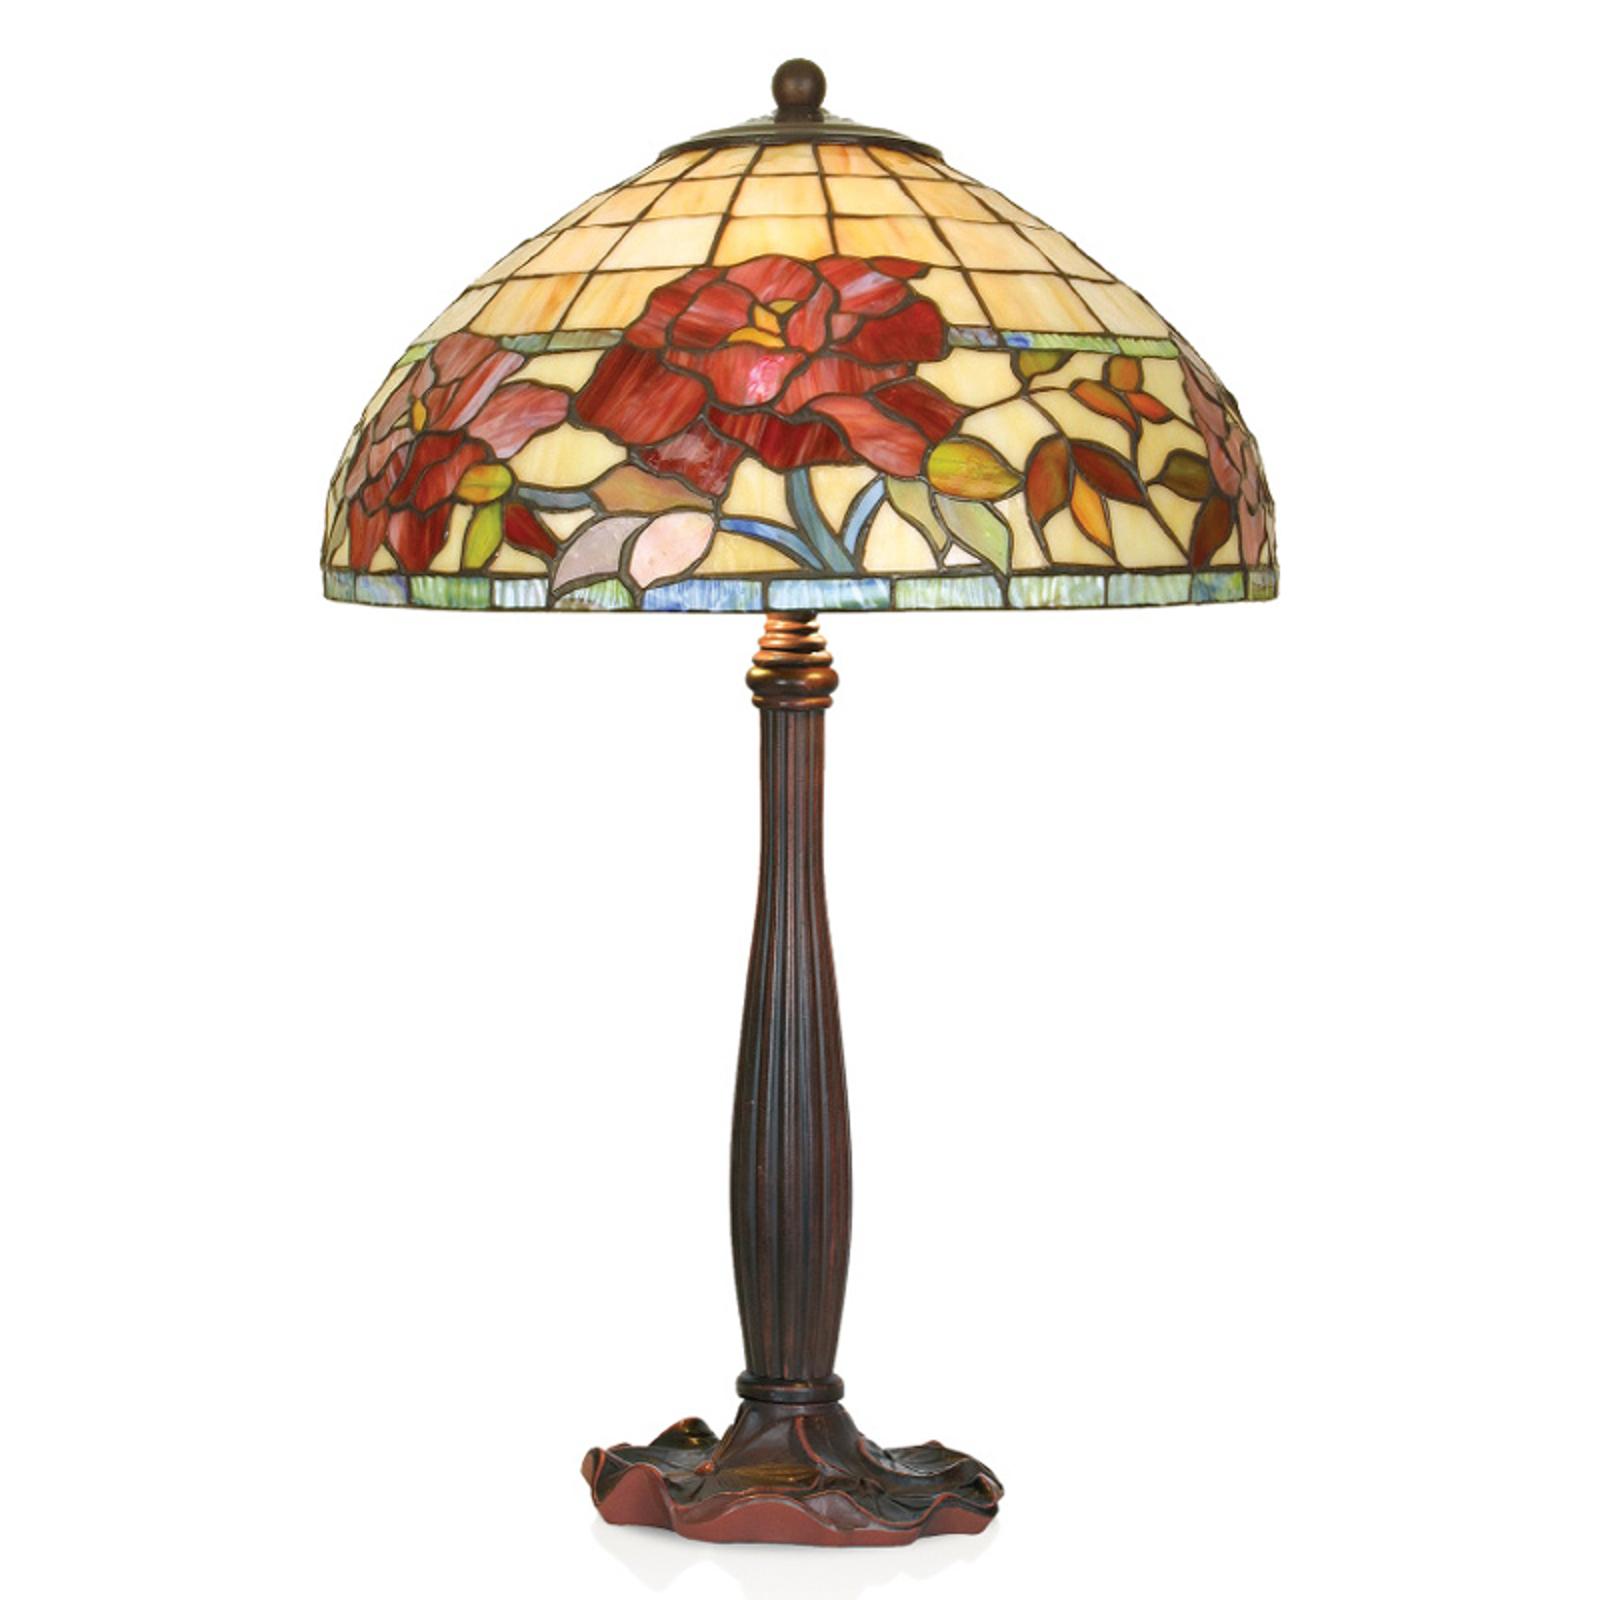 Handgemaakte tafellamp Esmee in Tiffany-stijl